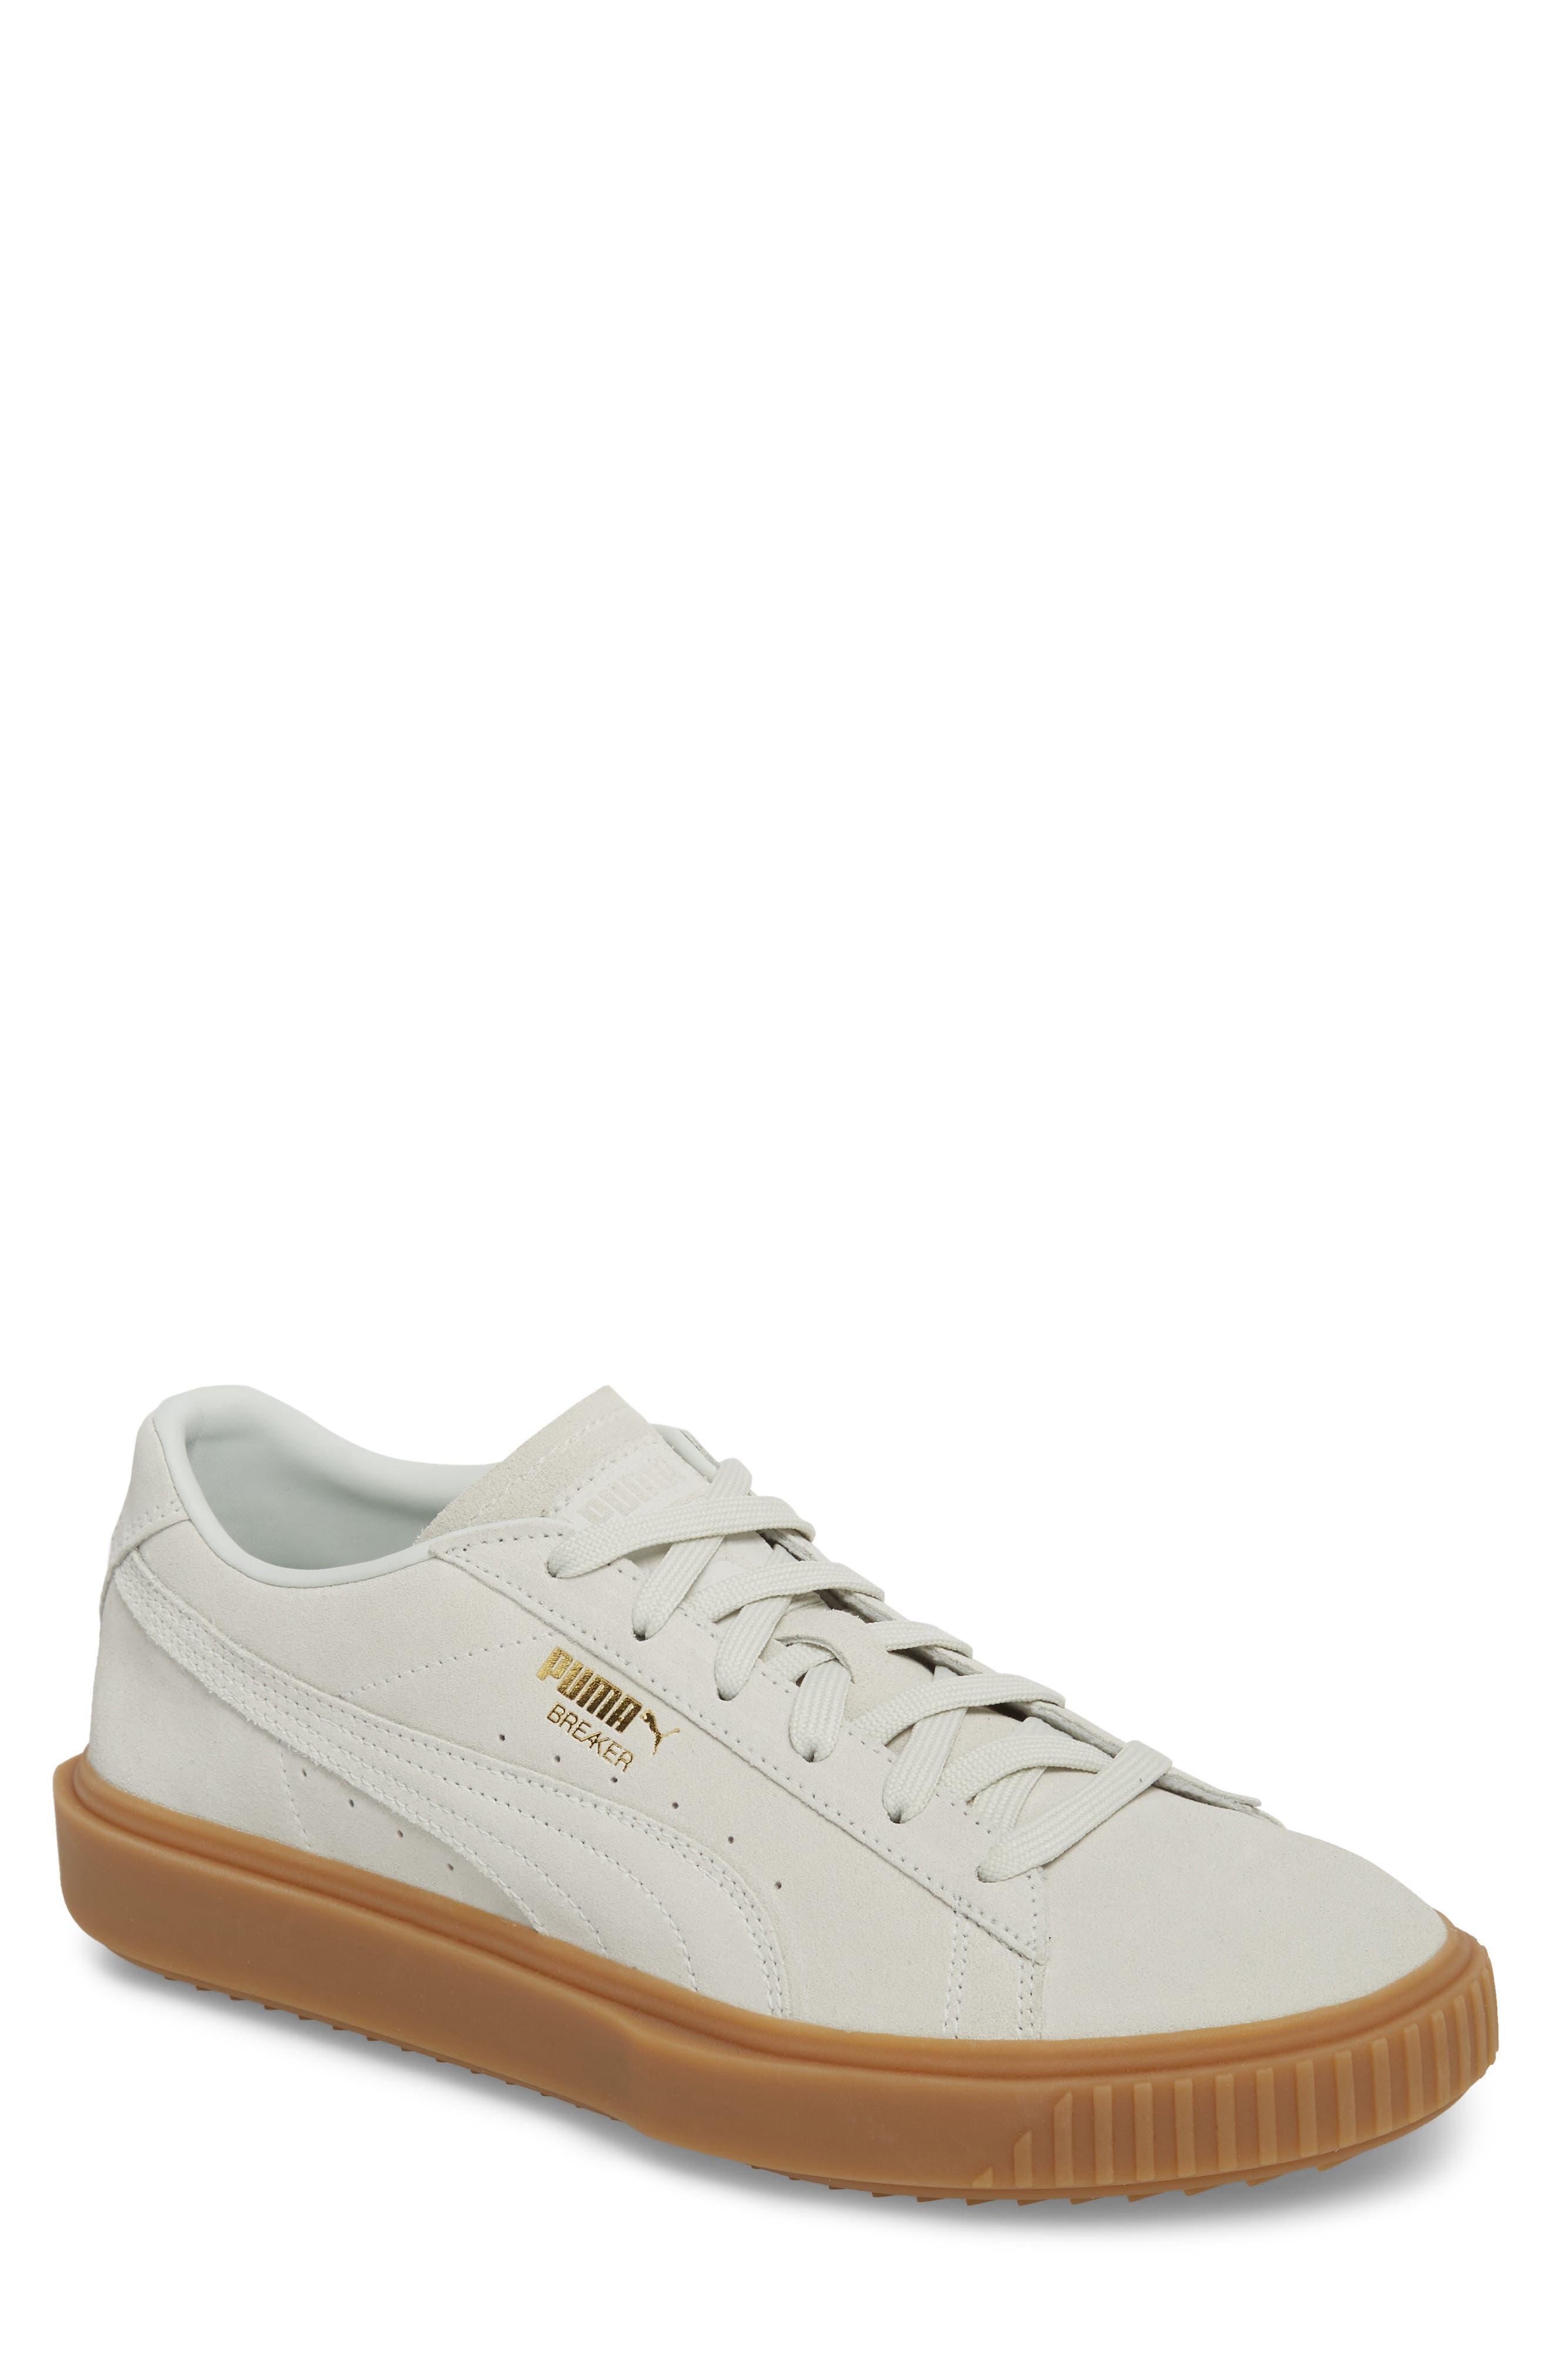 PUMA Breaker Suede Gum Low Top Sneaker (Men)